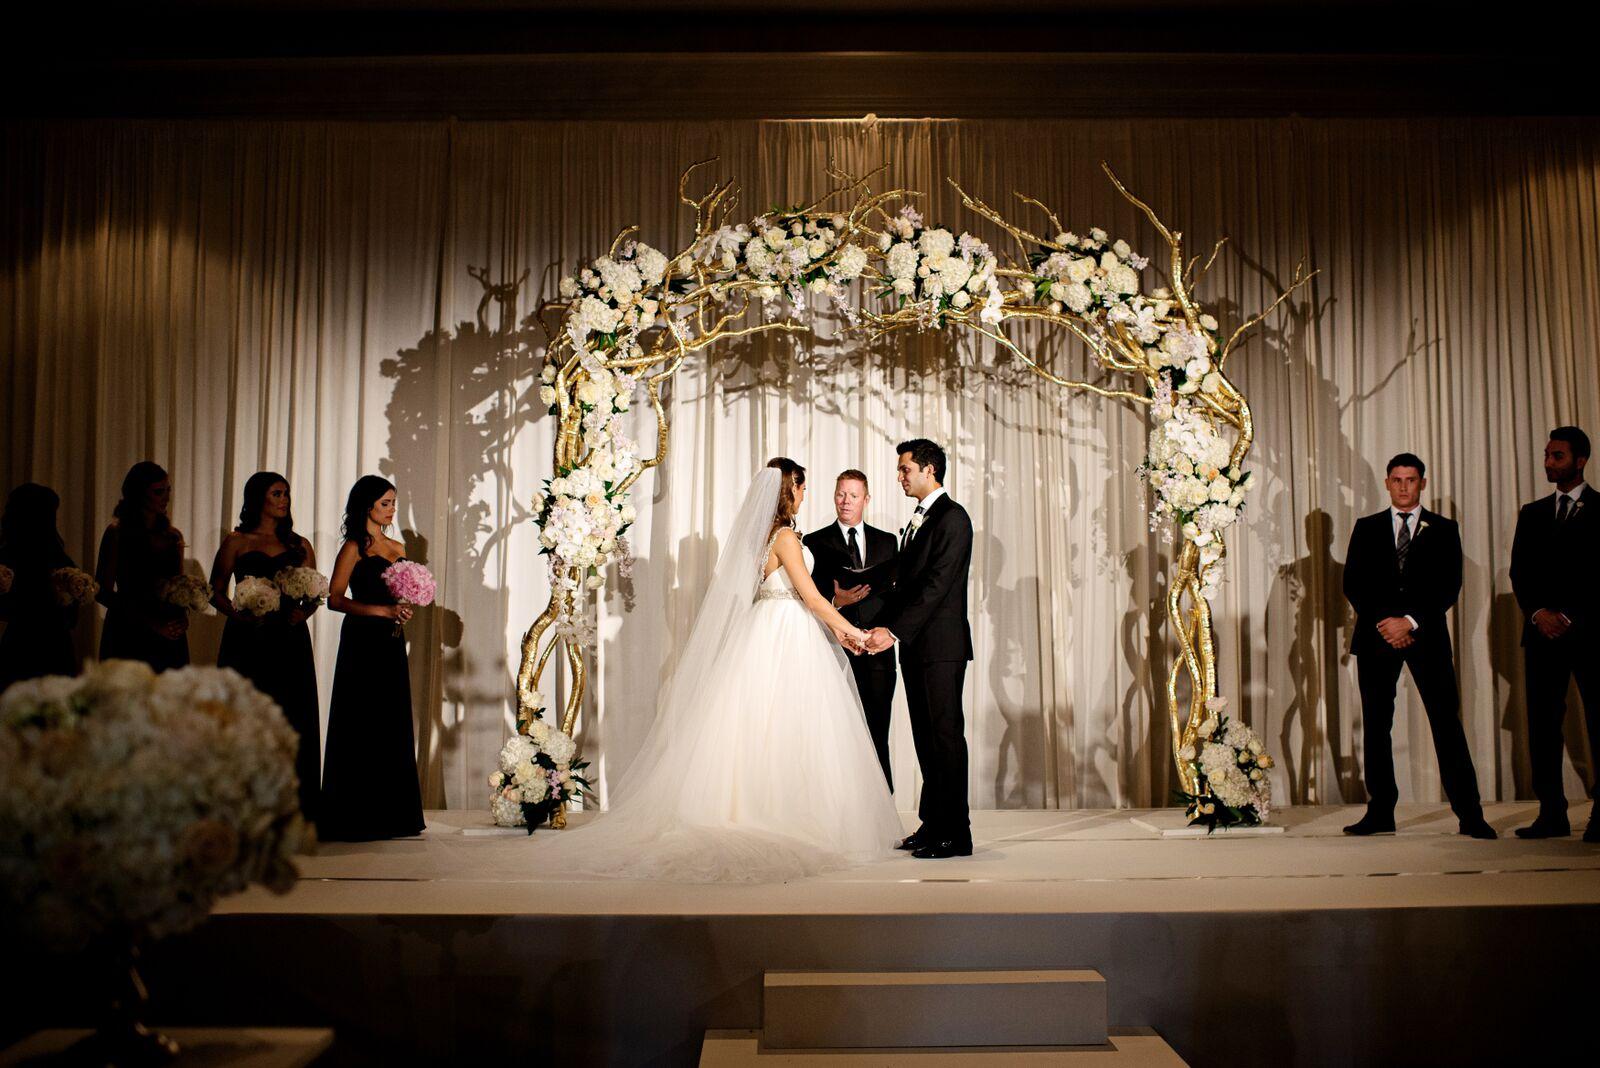 Wedding Photographer: Kristen Weaver Photography | Wedding Ceremony: The Ritz-Carlton Orlando | Wedding Planner: Weddings Unique